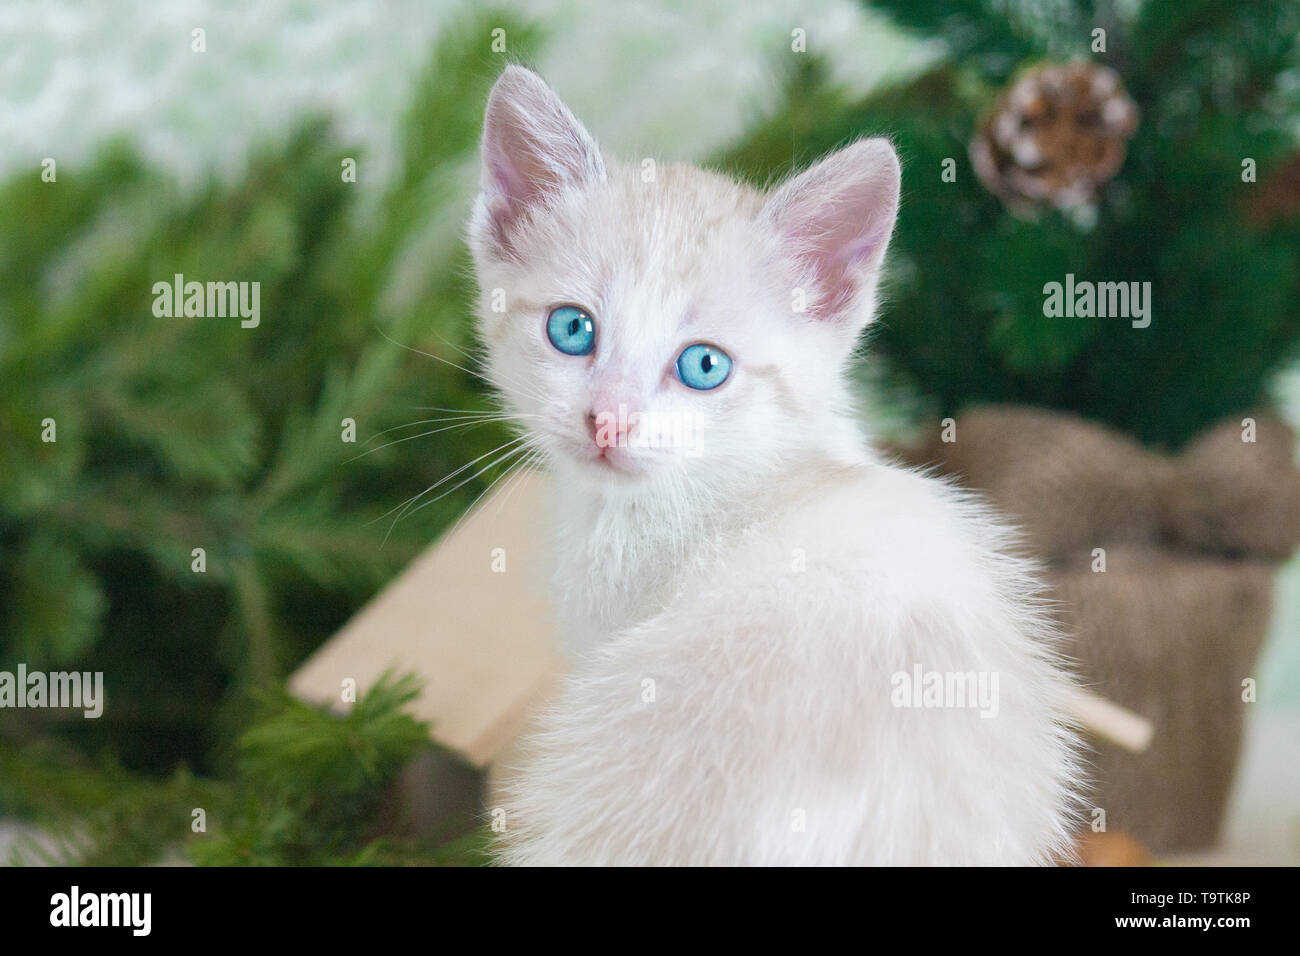 Pretty little kitty closeup. Cat looks at the camera. White furry predator. - Stock Image